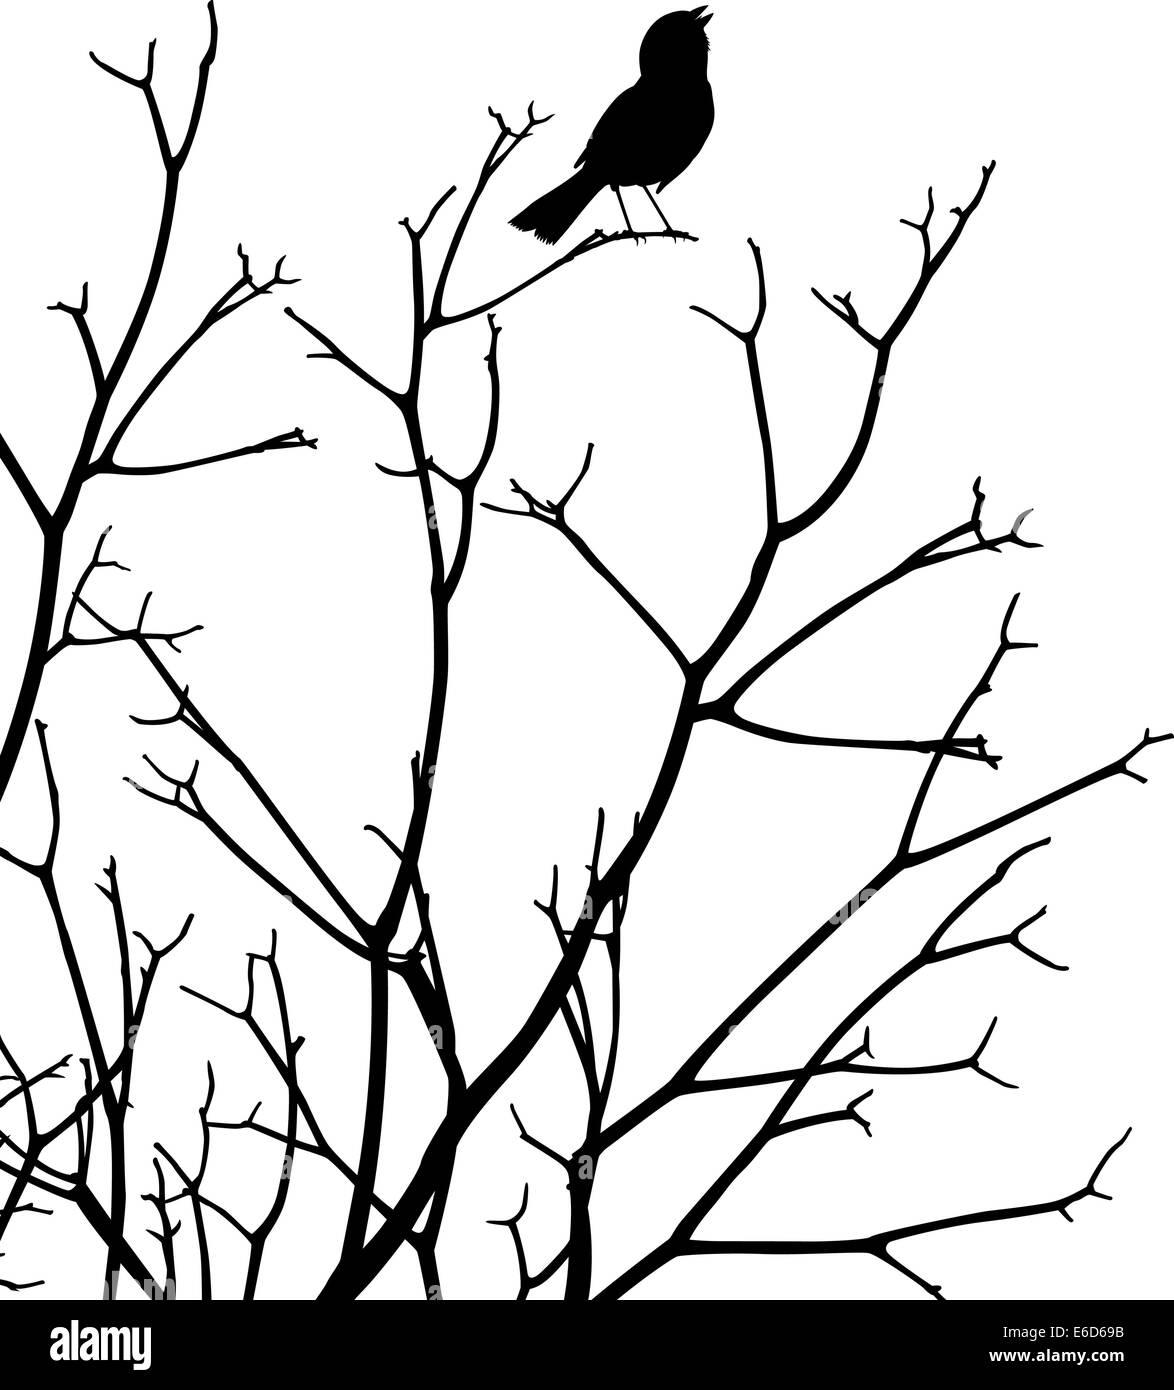 Silueta vectorial editable de un pájaro cantando en la parte superior de un árbol desnudo Imagen De Stock